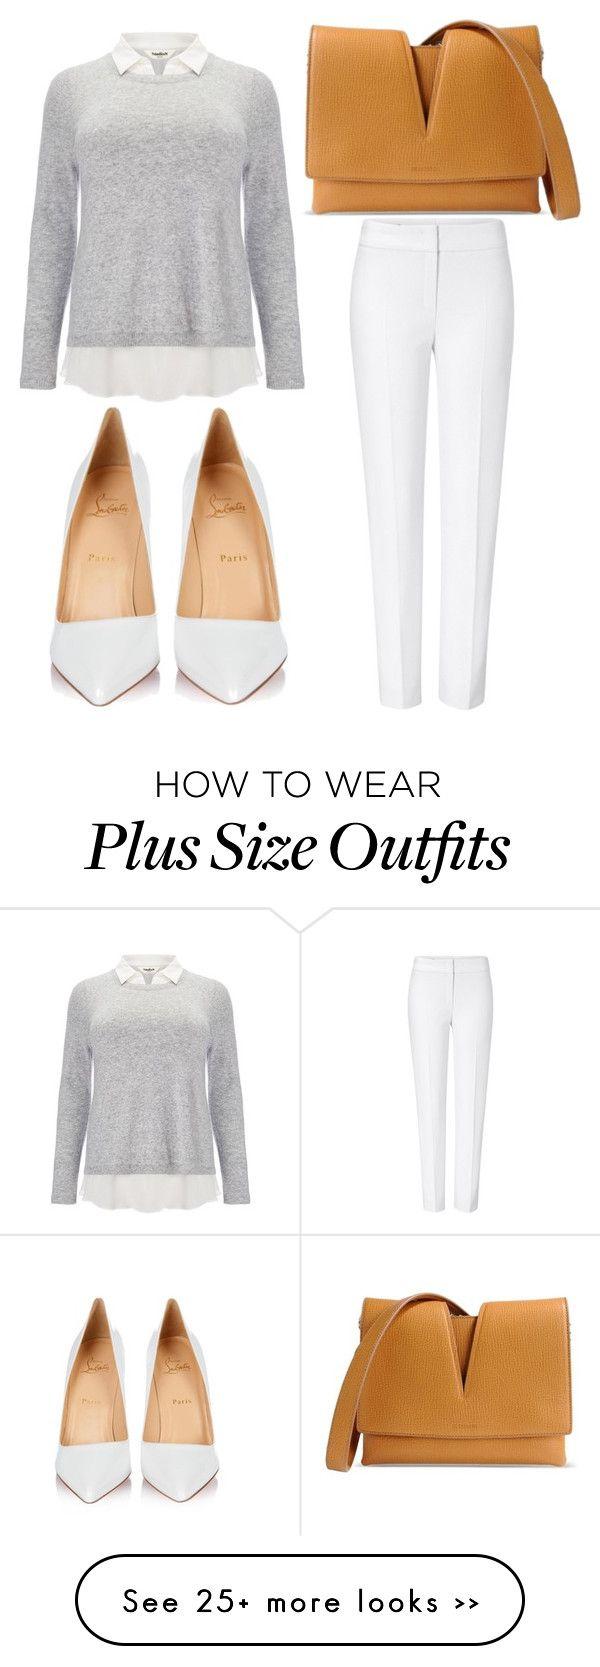 Trend To Wear: Plus Size Sets